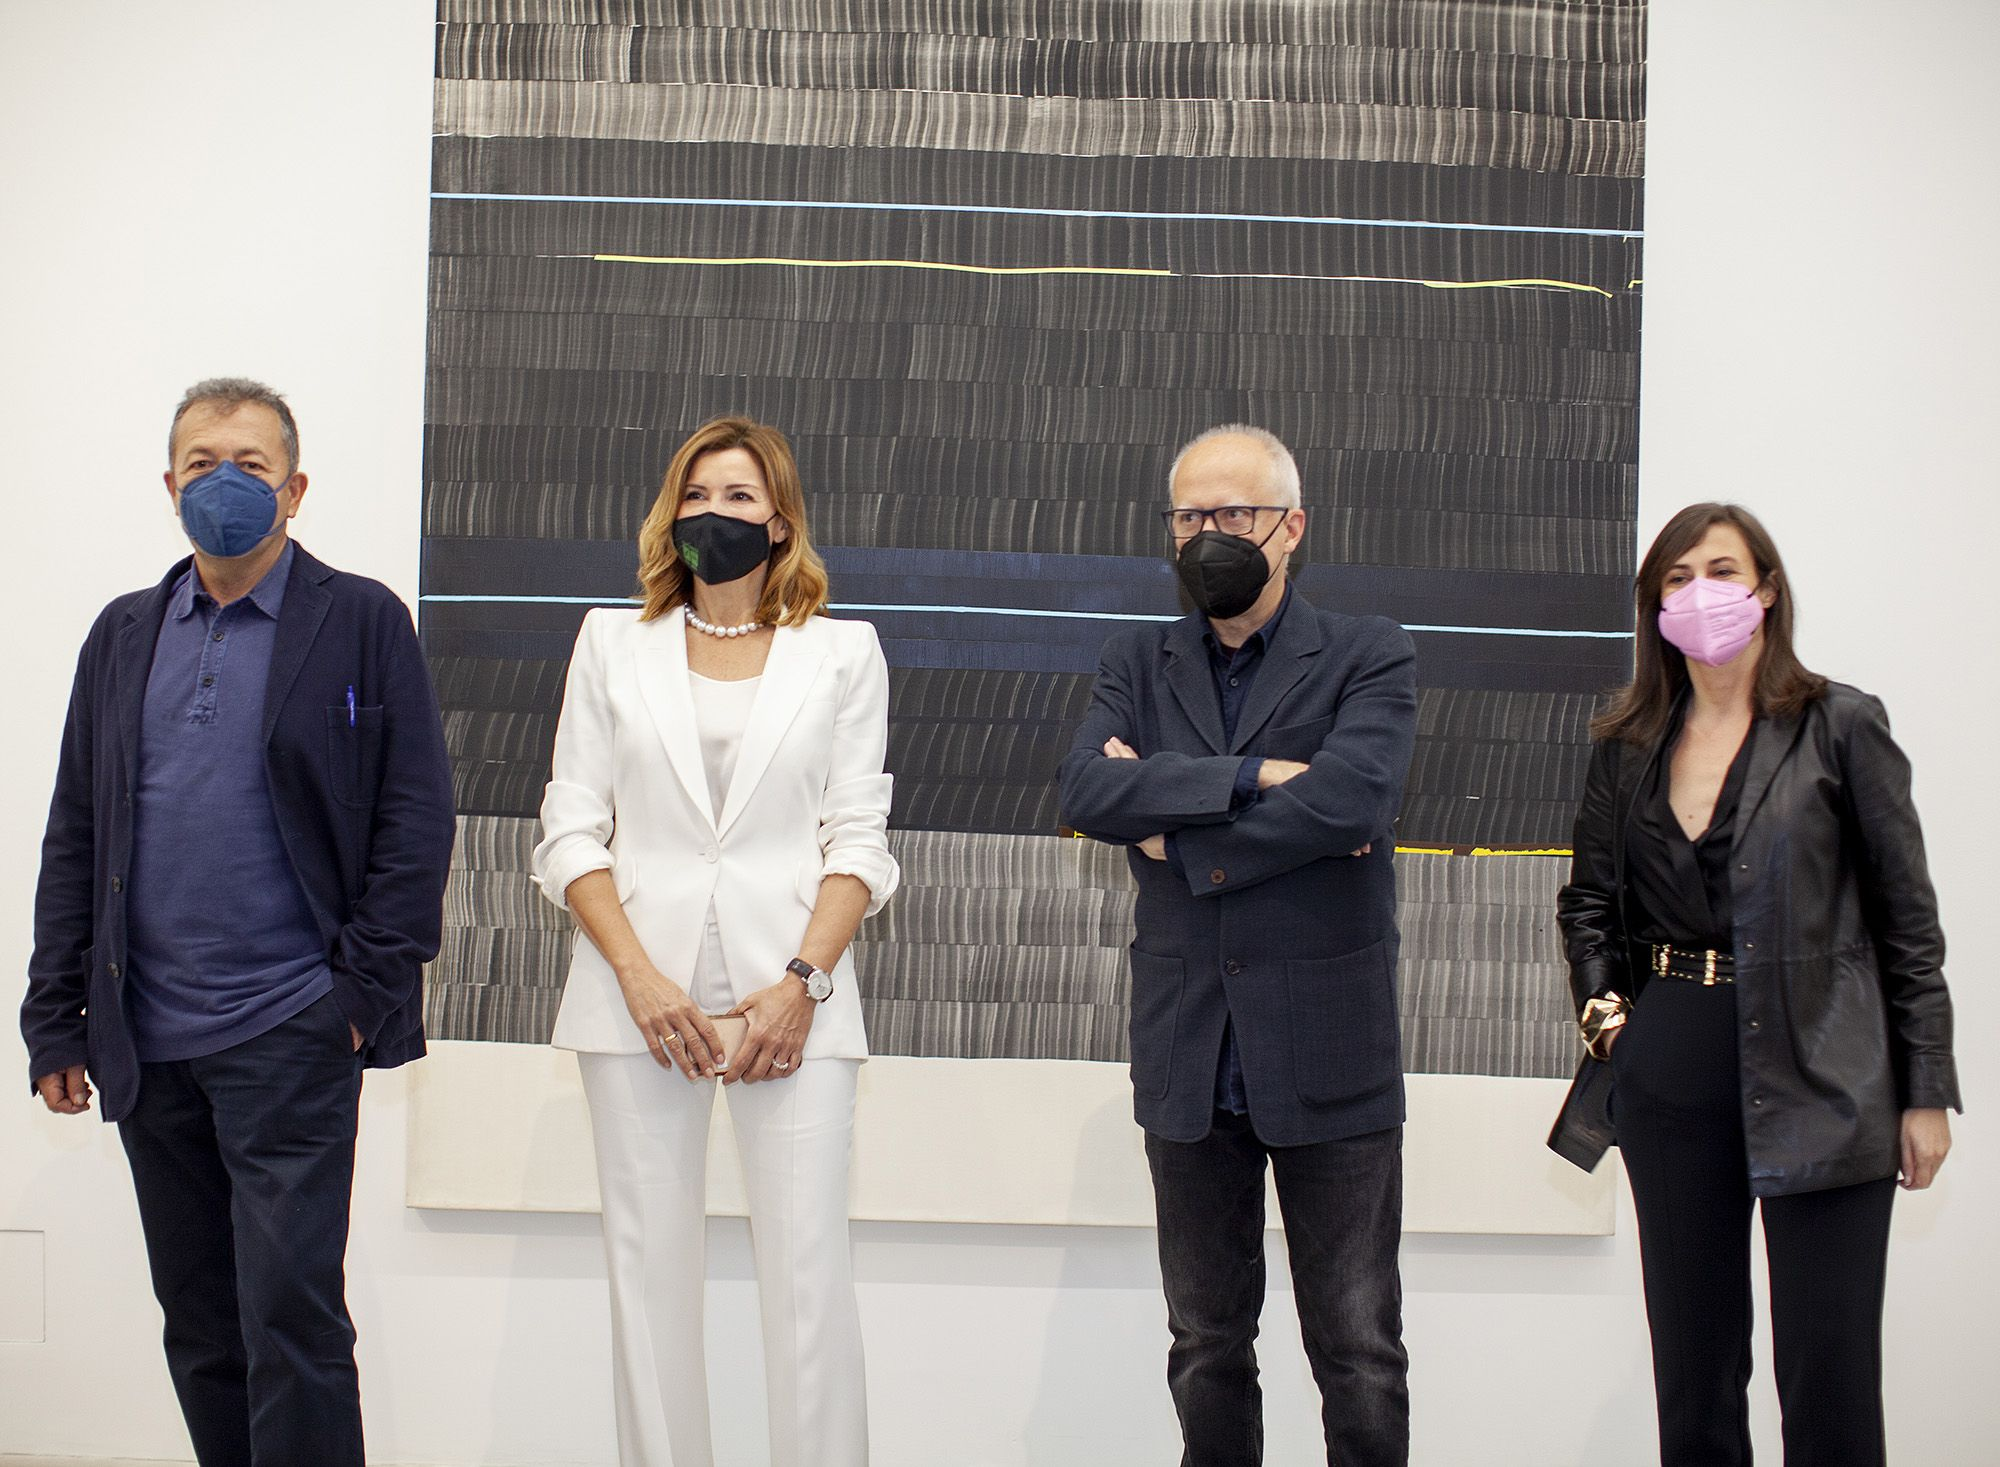 Vicent Todolí, Susana Lloret, Juan Uslé y Sandra Guimaraes.